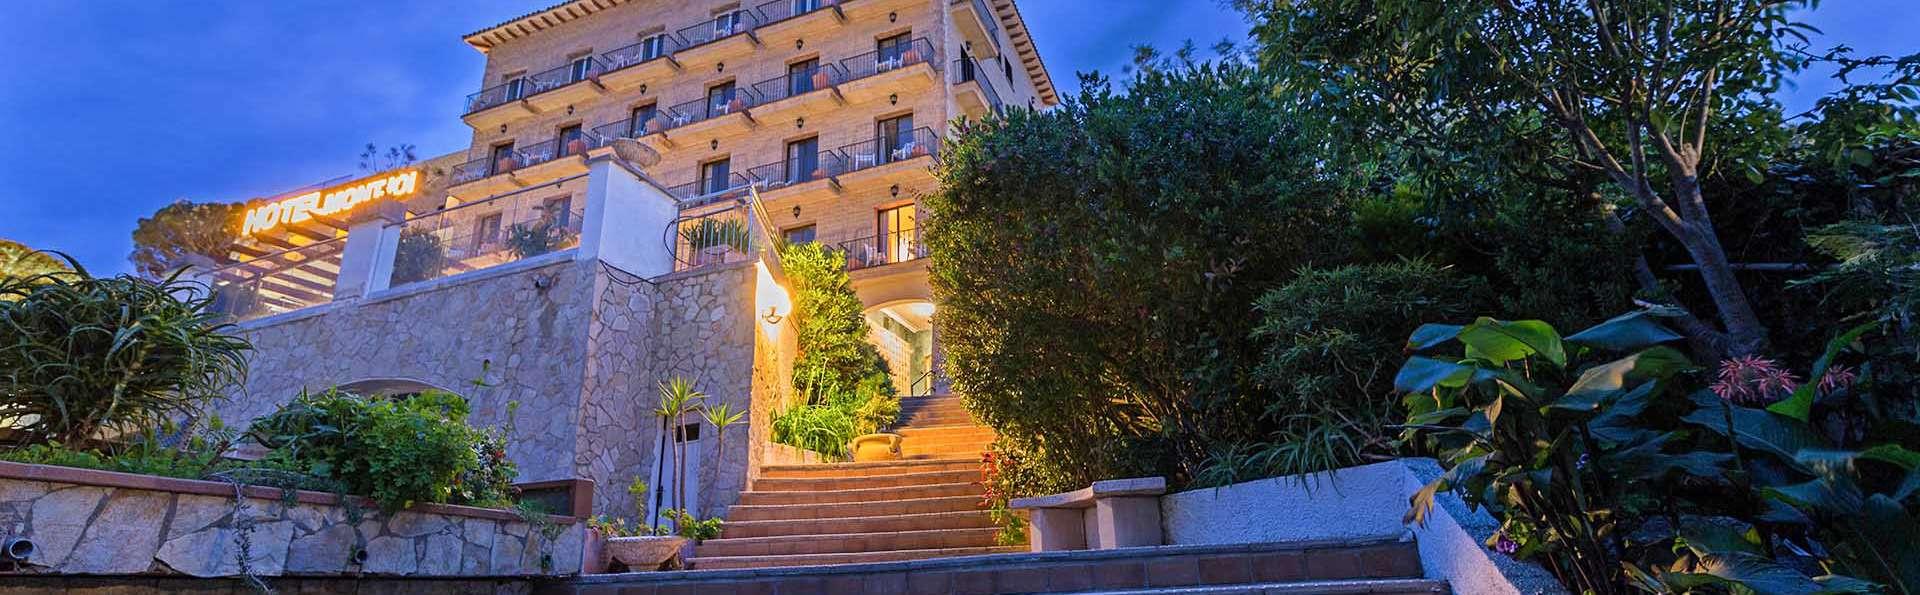 Hotel Montjoi - EDIT_EXTERIOR_02.jpg